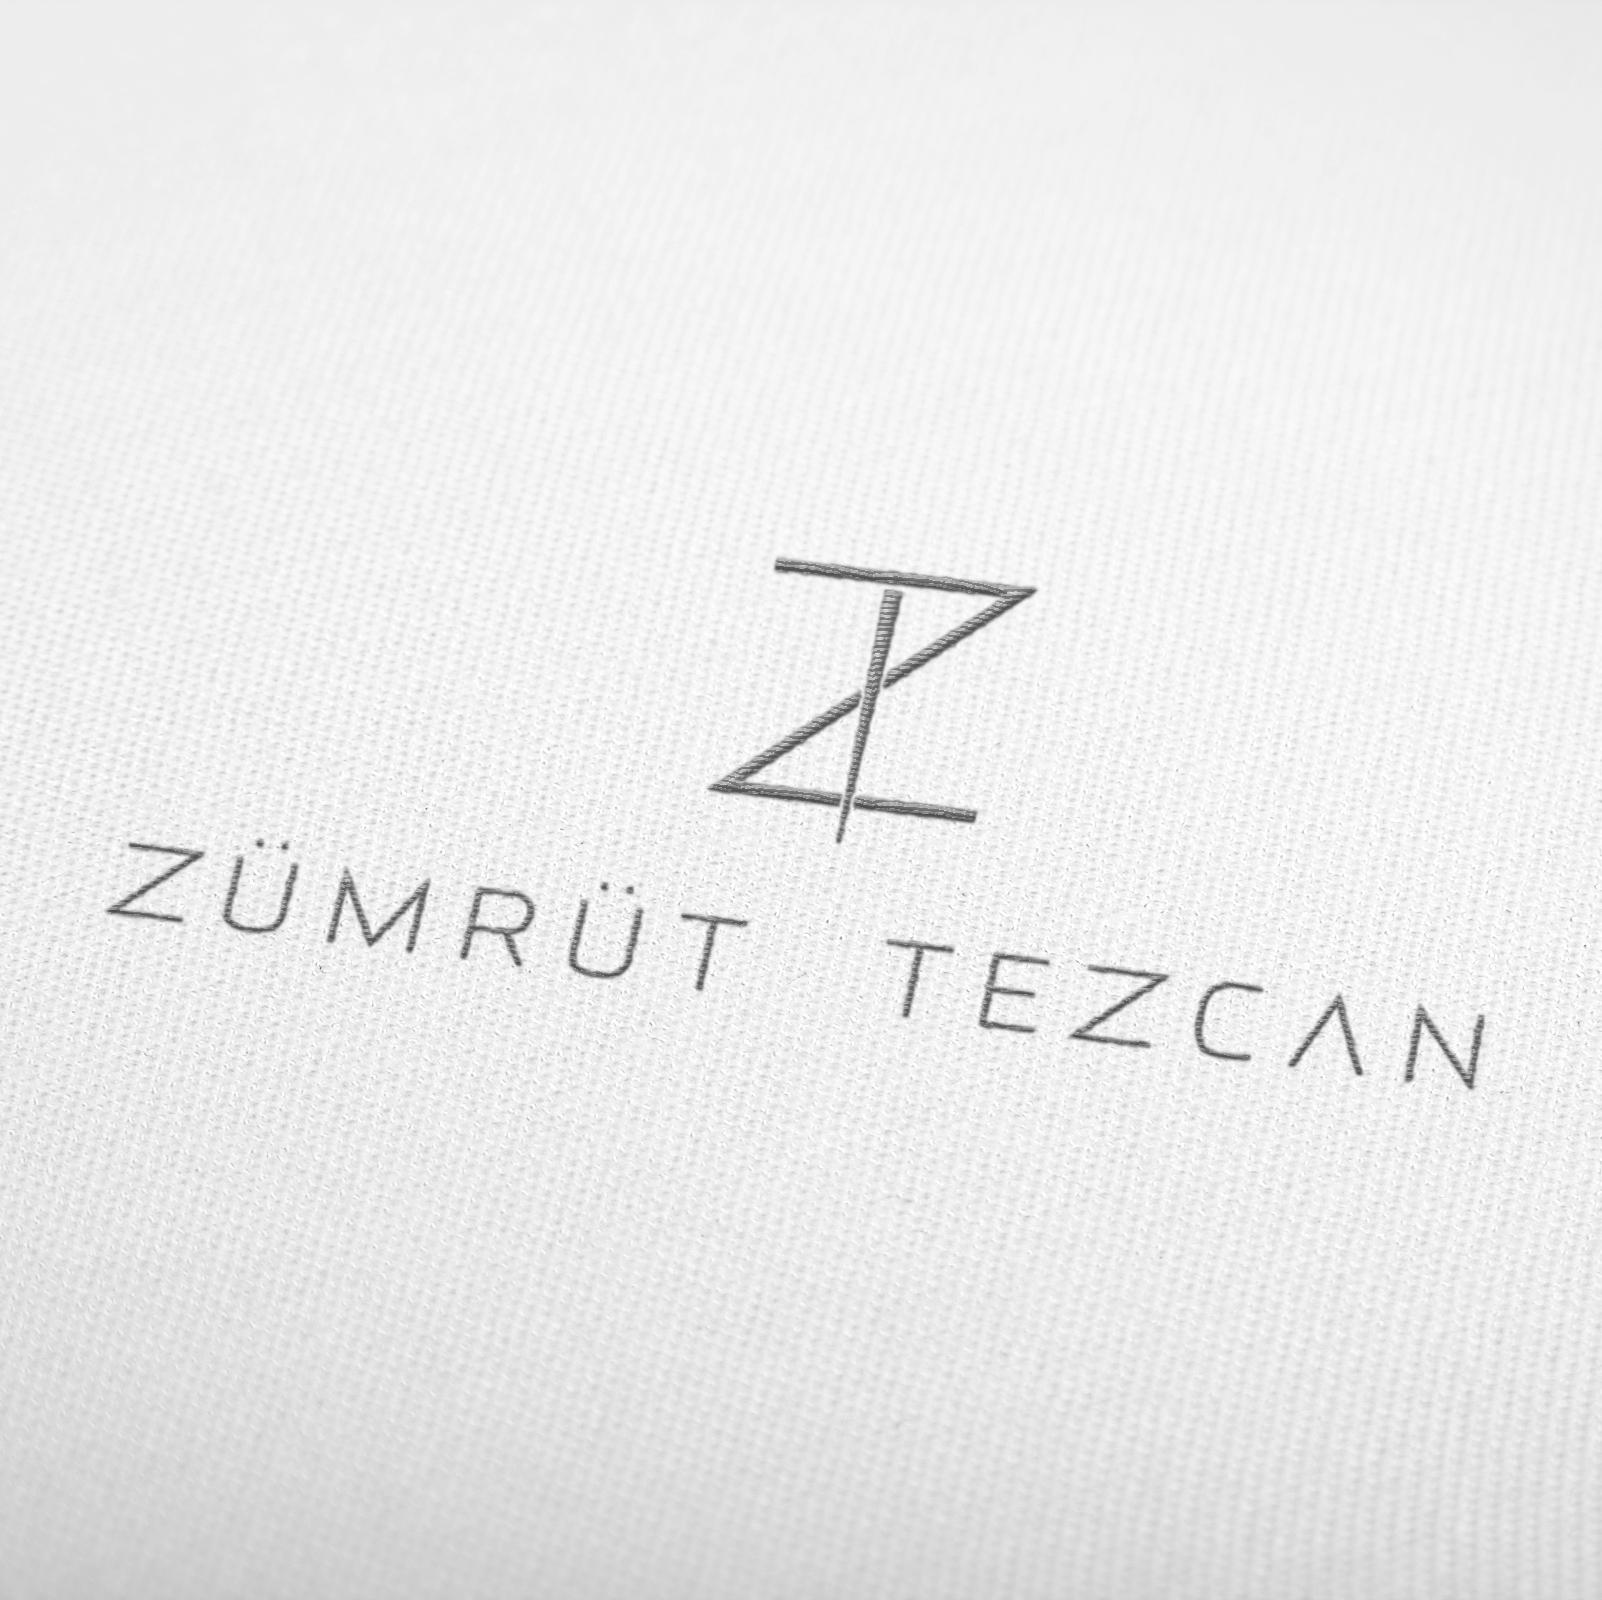 Zümrüt Tezcan